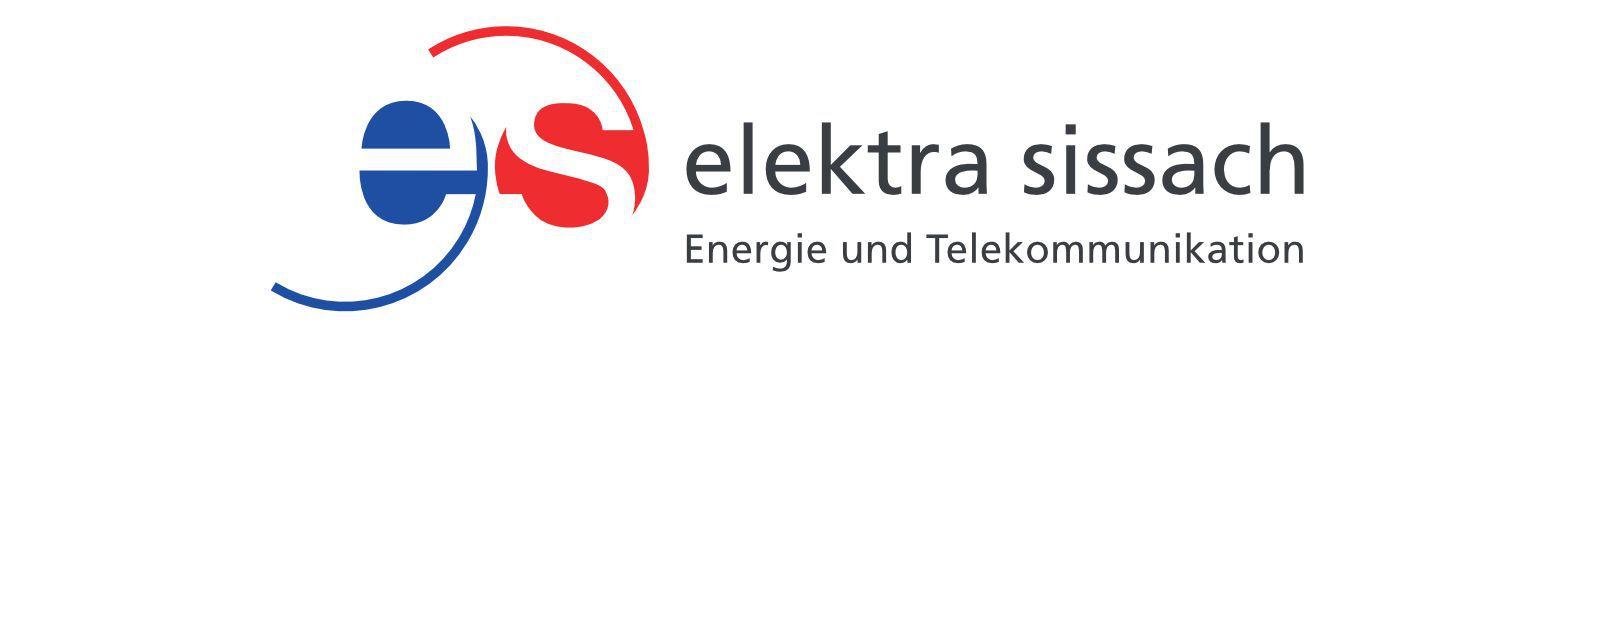 Elektra Sissach